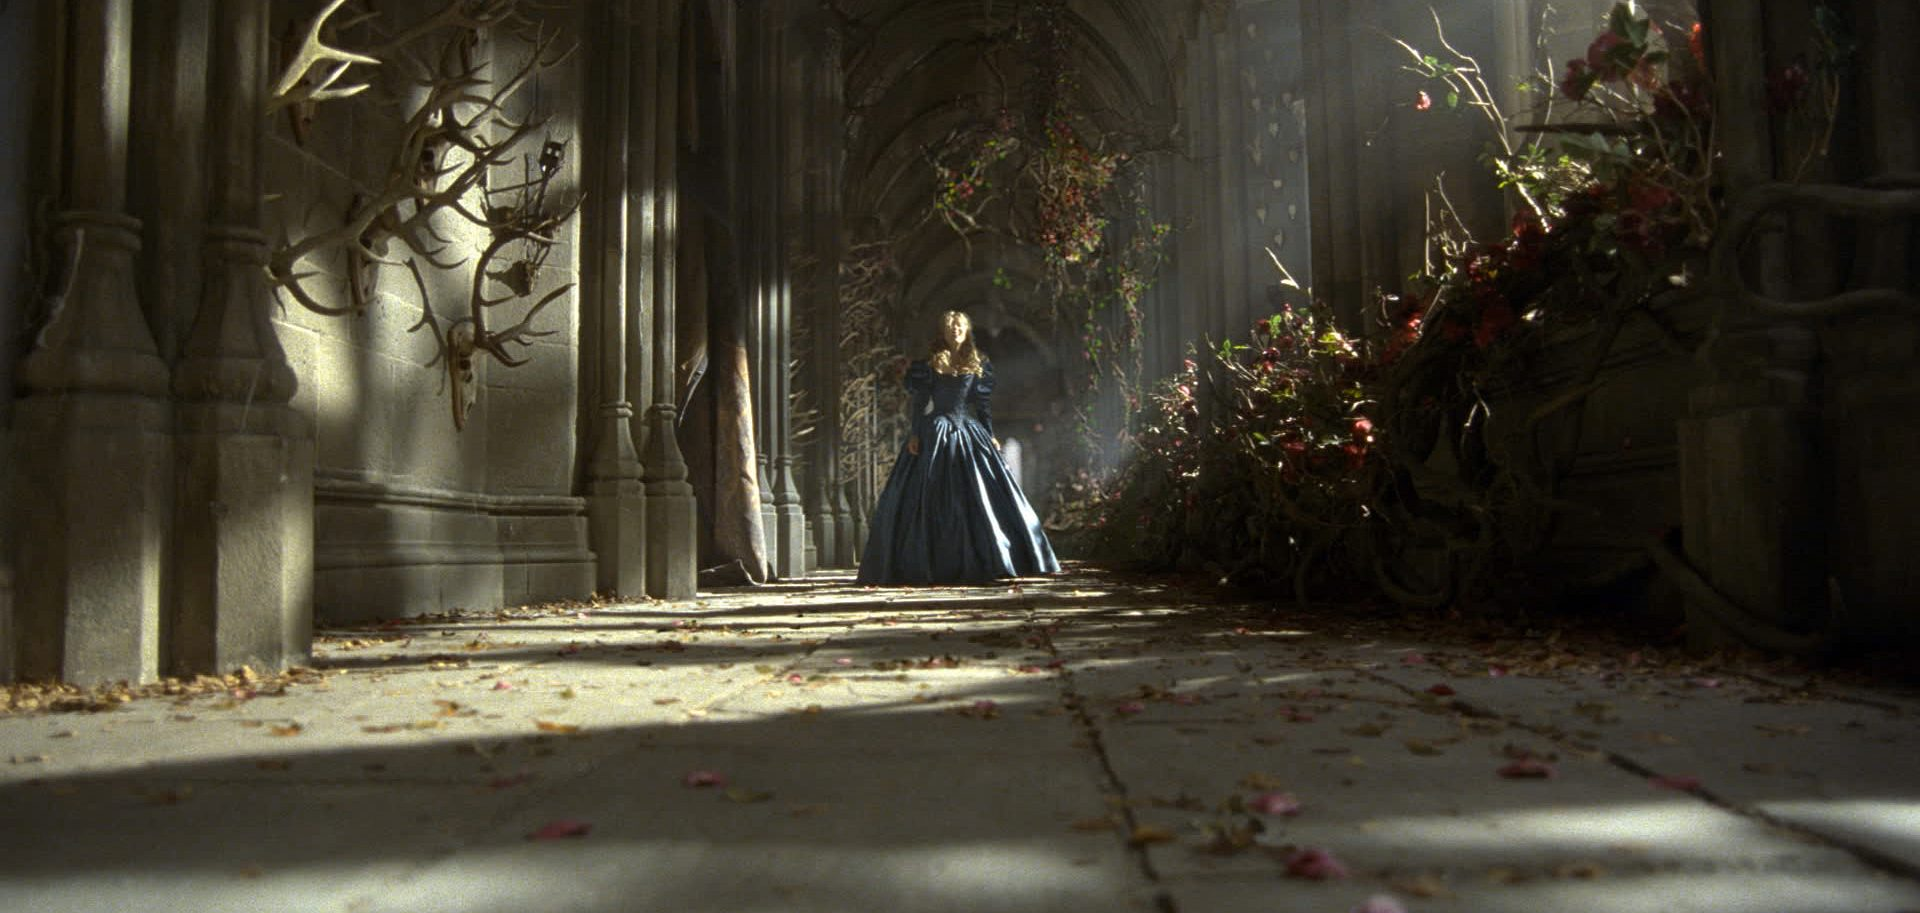 la-belle-et-la-bete-castle-inside-hallway